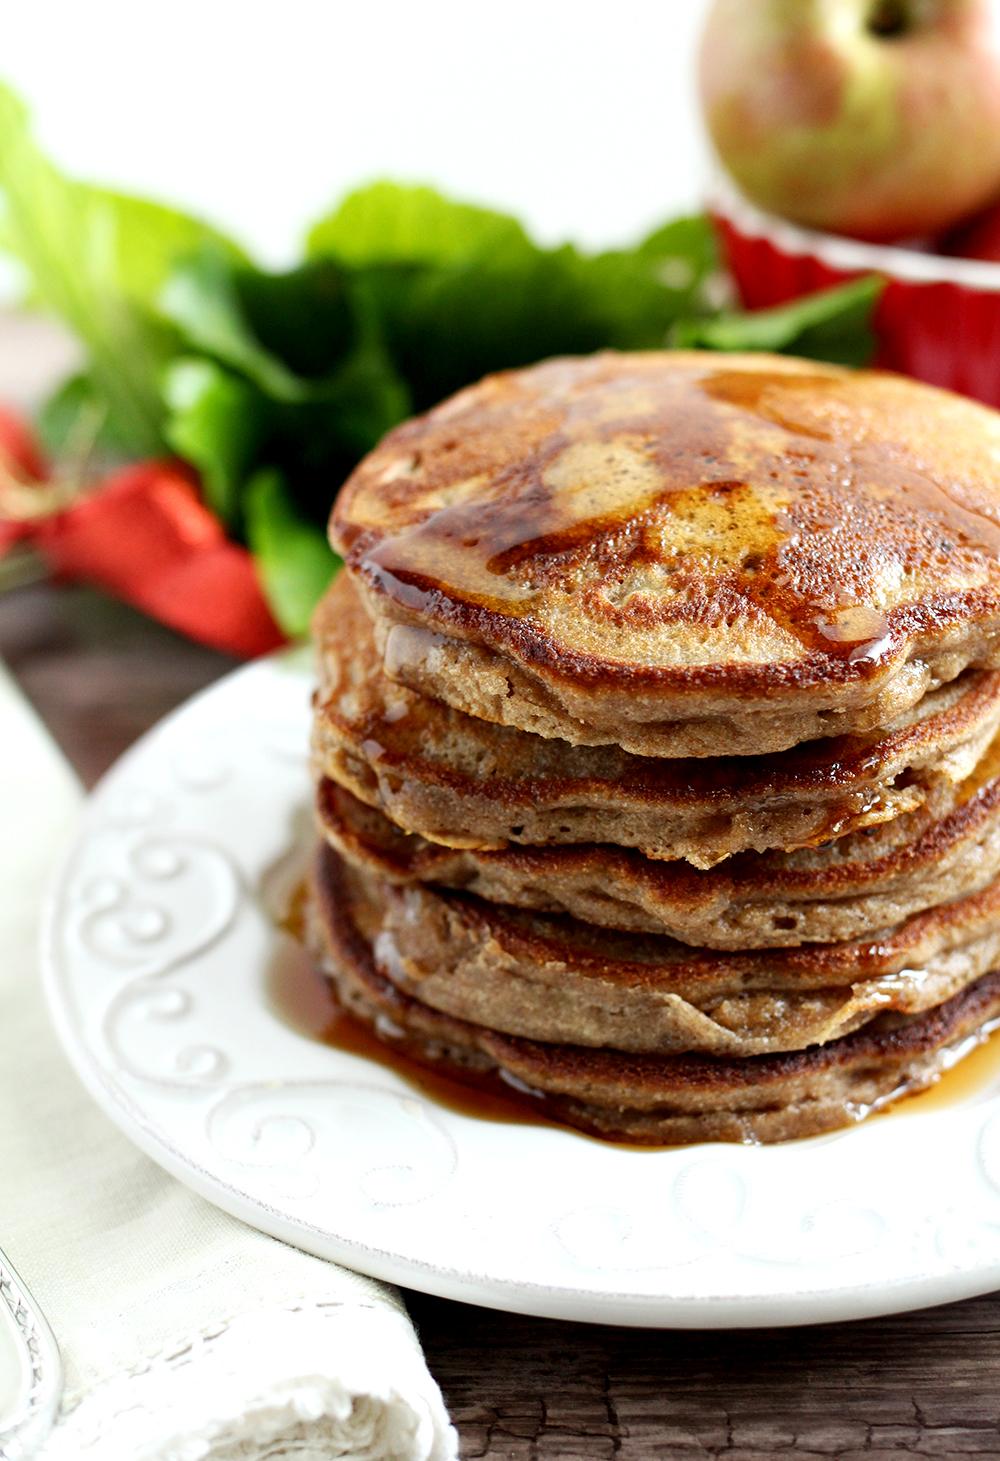 Paleo Cinnamon Apple Pancakes (made with cassava flour: gluten-free, grain-free, nut-free, dairy-free, and refined sugar-free)